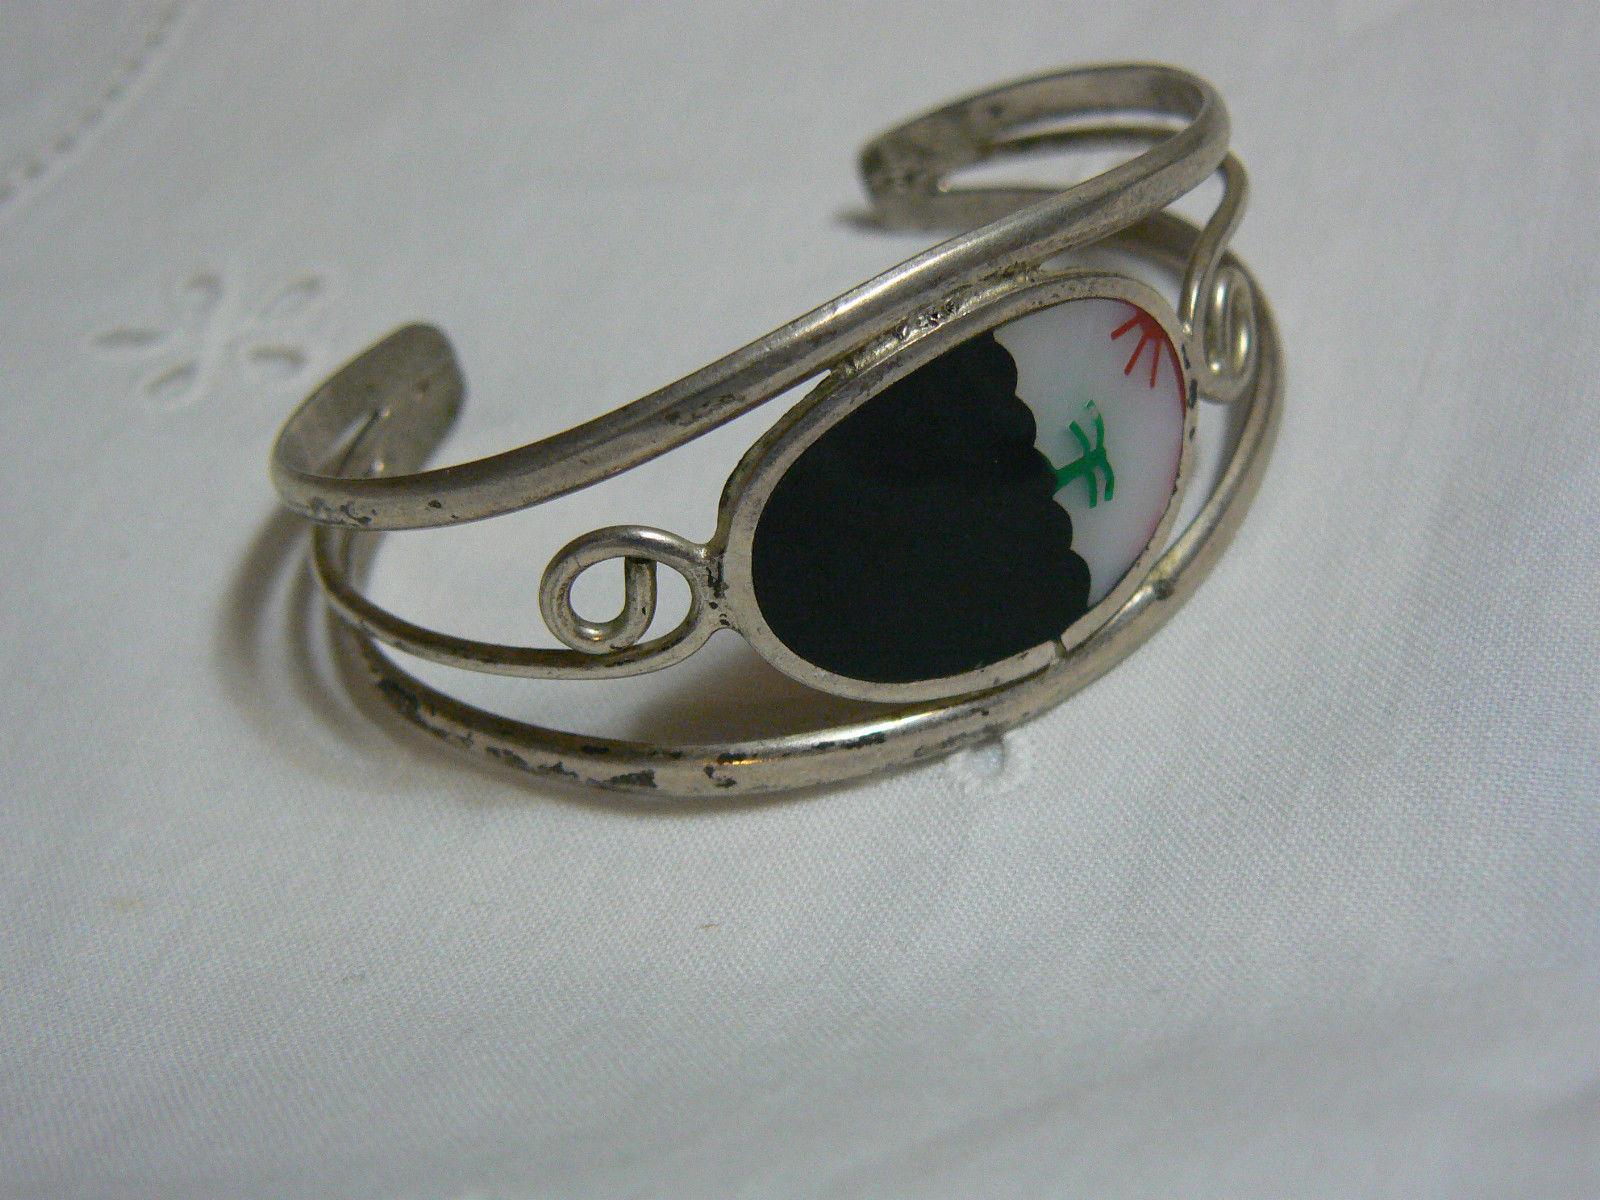 Vintage Alpaca Mexico Inlaid Abalone Silver Cuff Bracelet